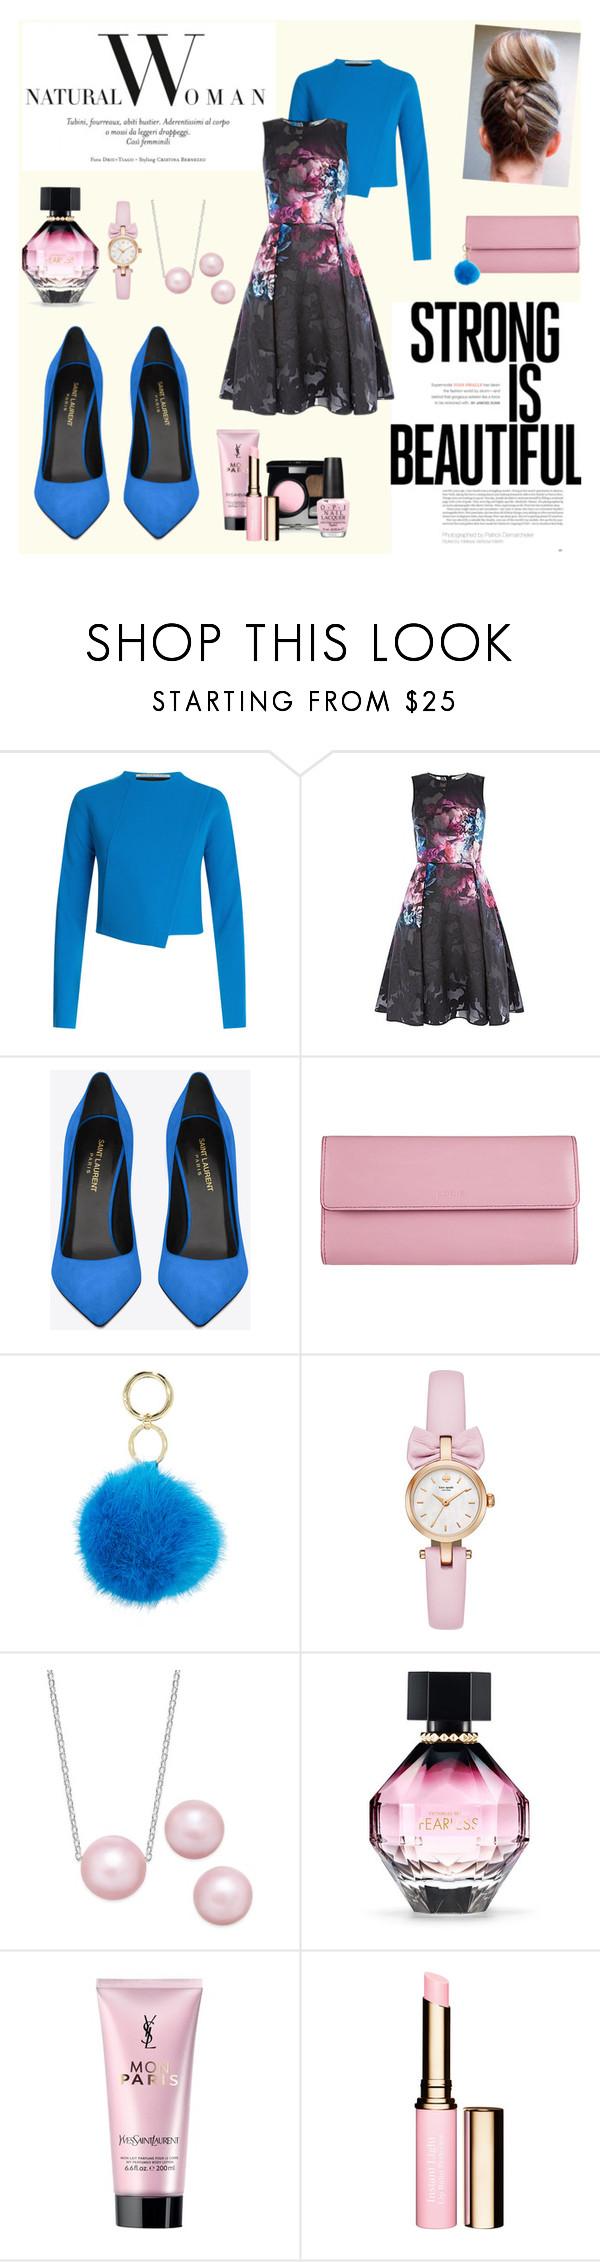 """Saint Laurent"" by suljic-melika ❤ liked on Polyvore featuring Roland Mouret, Yves Saint Laurent, Lodis, Iphoria, Victoria's Secret, OPI, black, rose and polyvorefashion"